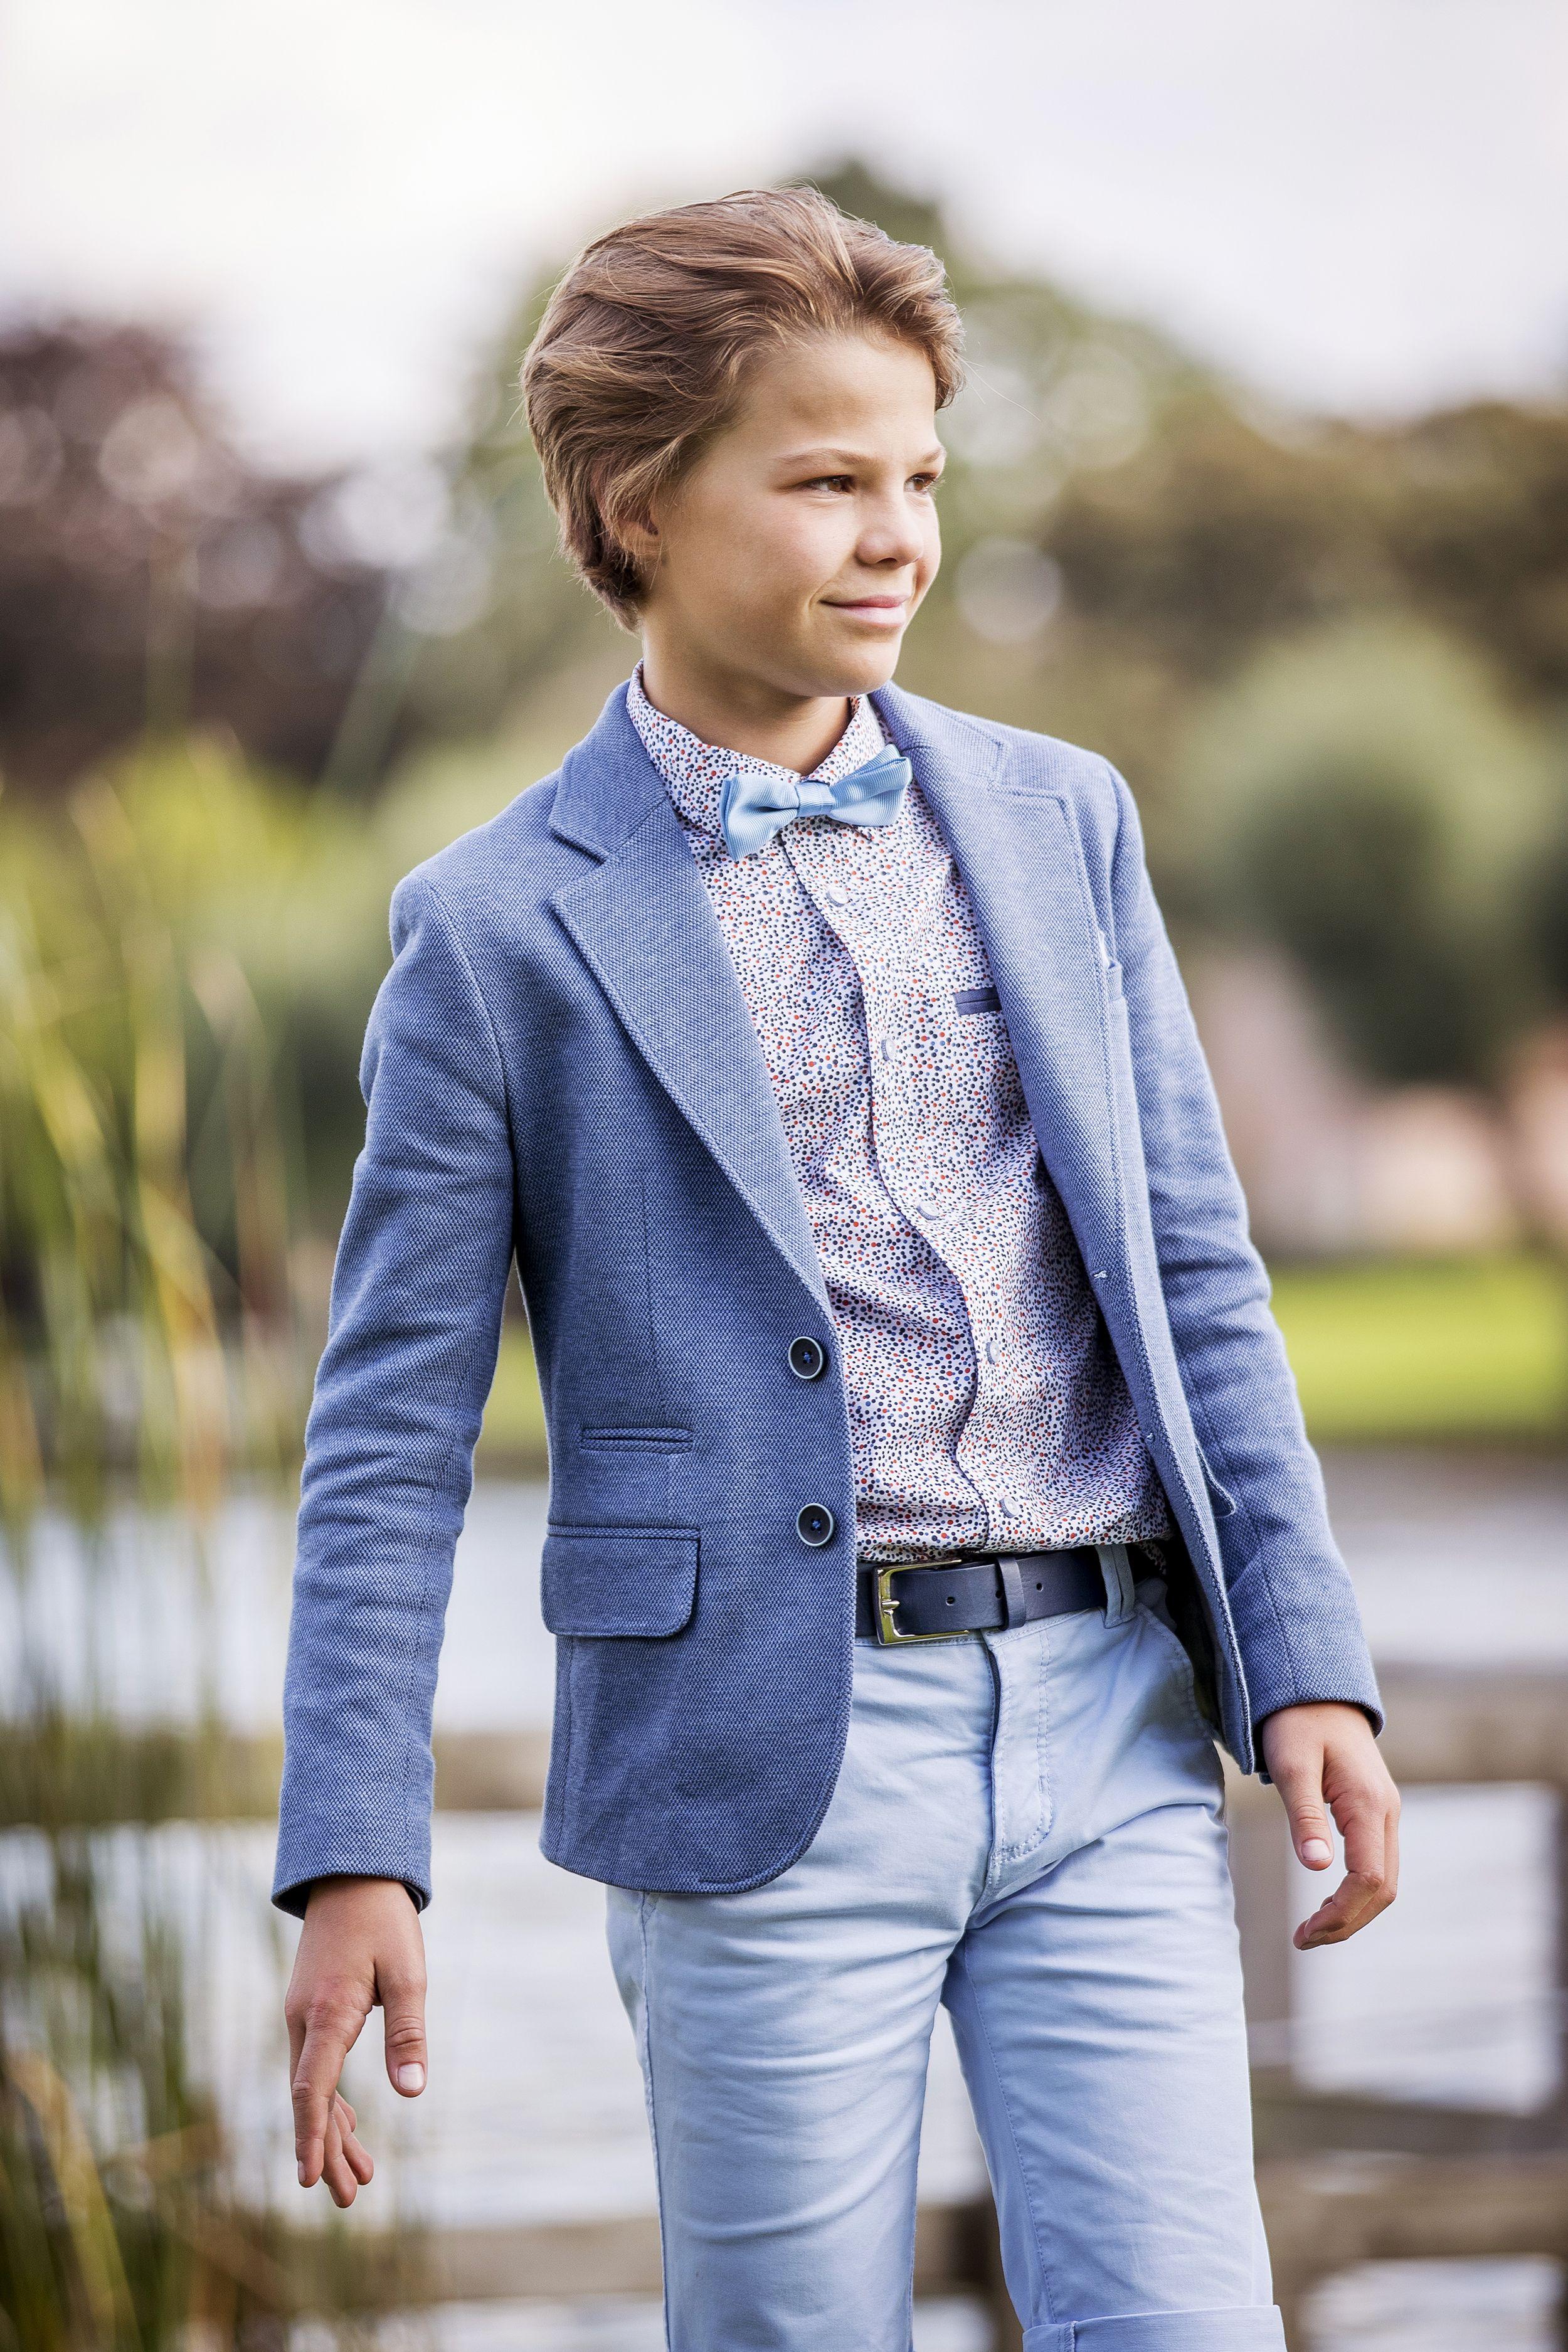 405a66f28e5 Boys | boys fashion - Jongens, Kleren en Fotografie kinderen